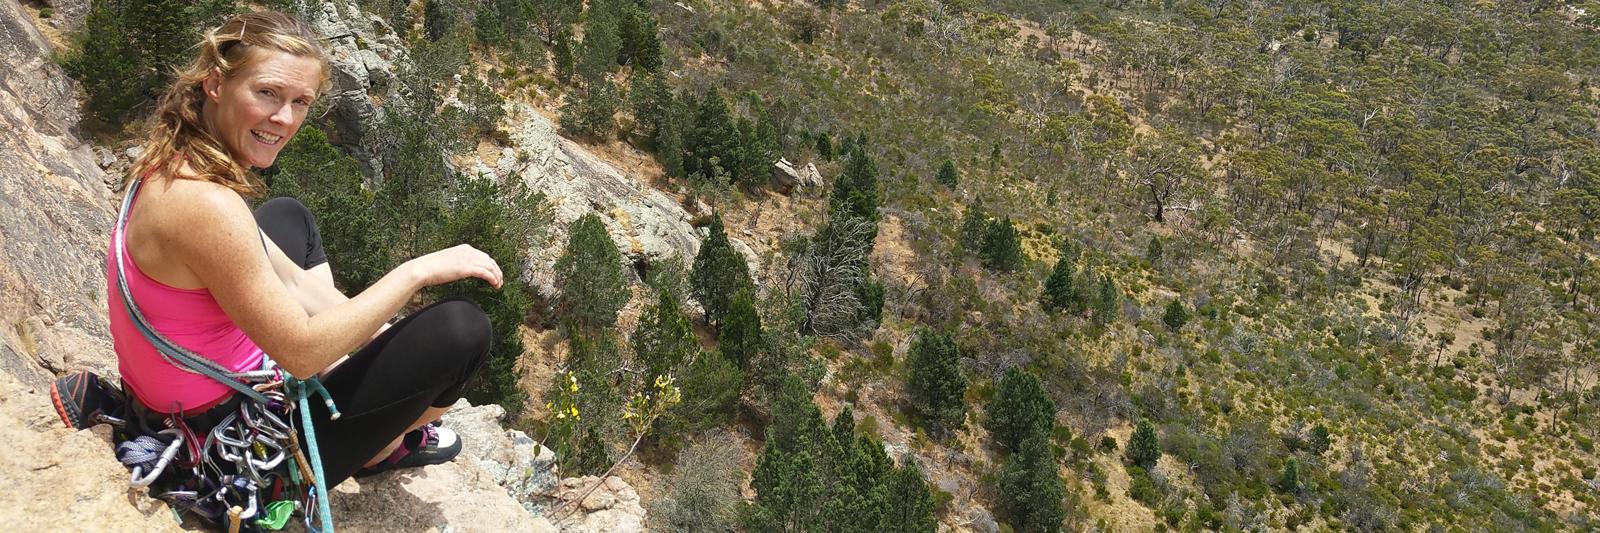 Rock-Climbing-Courses-Rock-Climbing-Holidays-Meet-the-Team-Robyn-Nelson